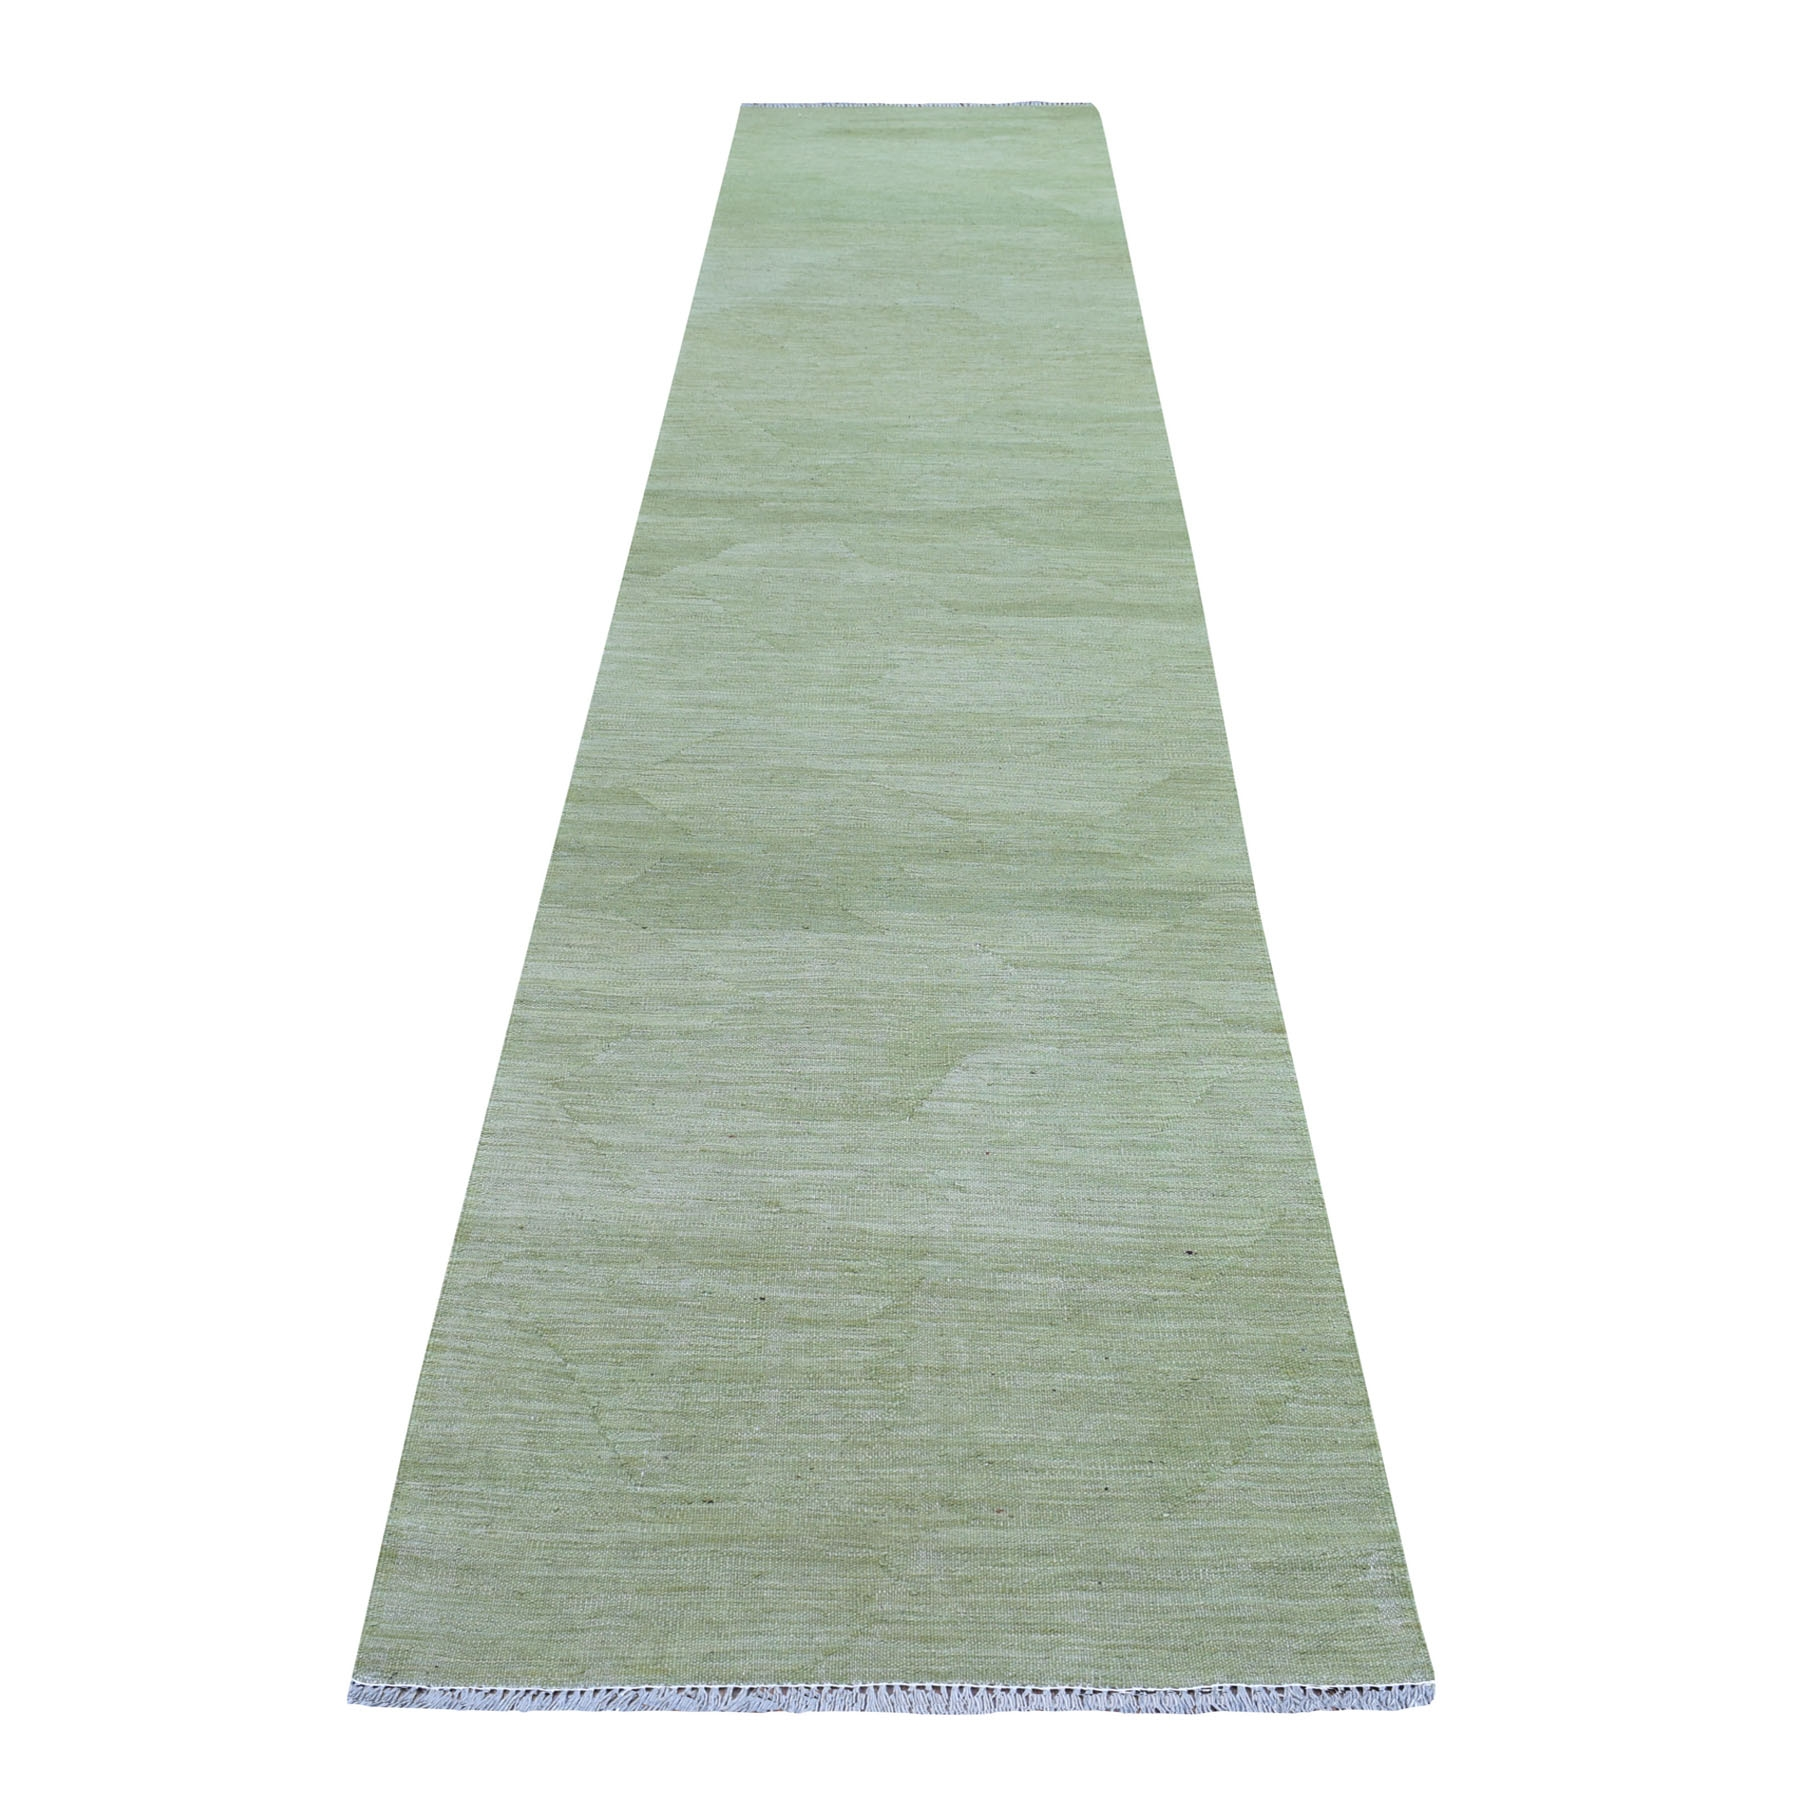 "2'8""X13' Green Shades Flat Weave Kilim Pure Wool Hand Woven Runner Oriental Rug moaec8cd"